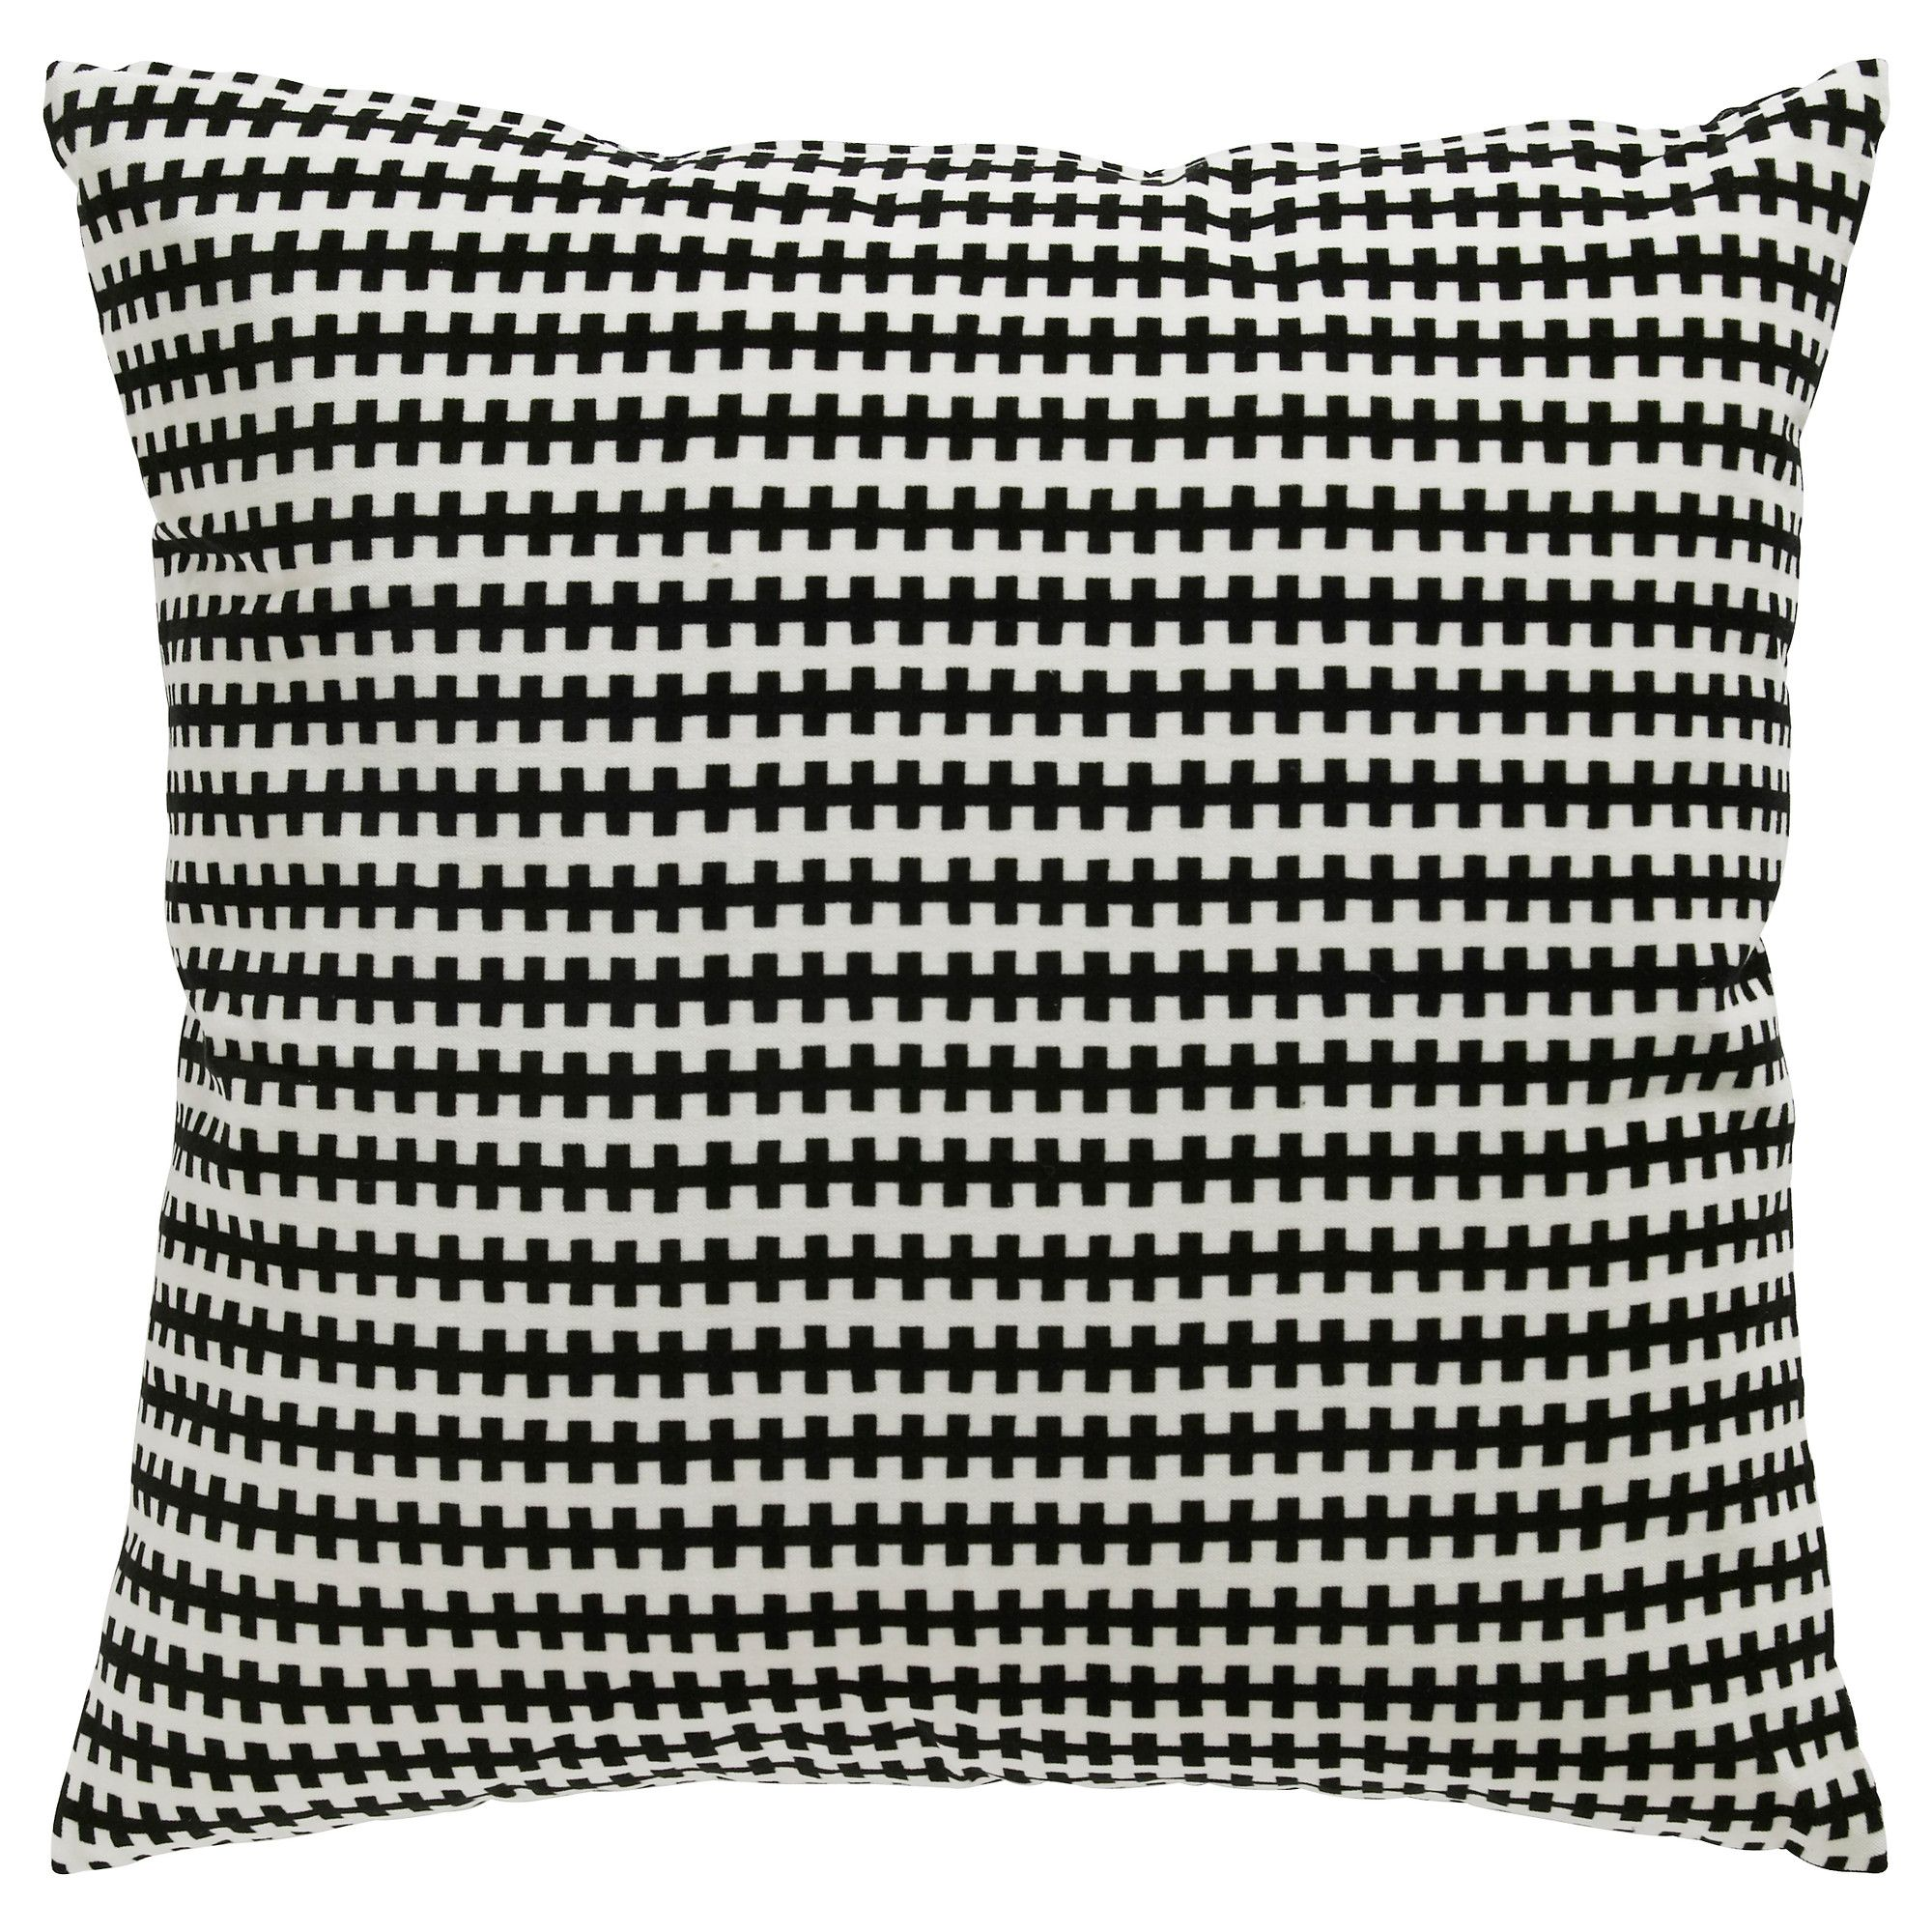 Ikea Us Furniture And Home Furnishings Ikea Stockholm Black And White Cushions Ikea Pillows